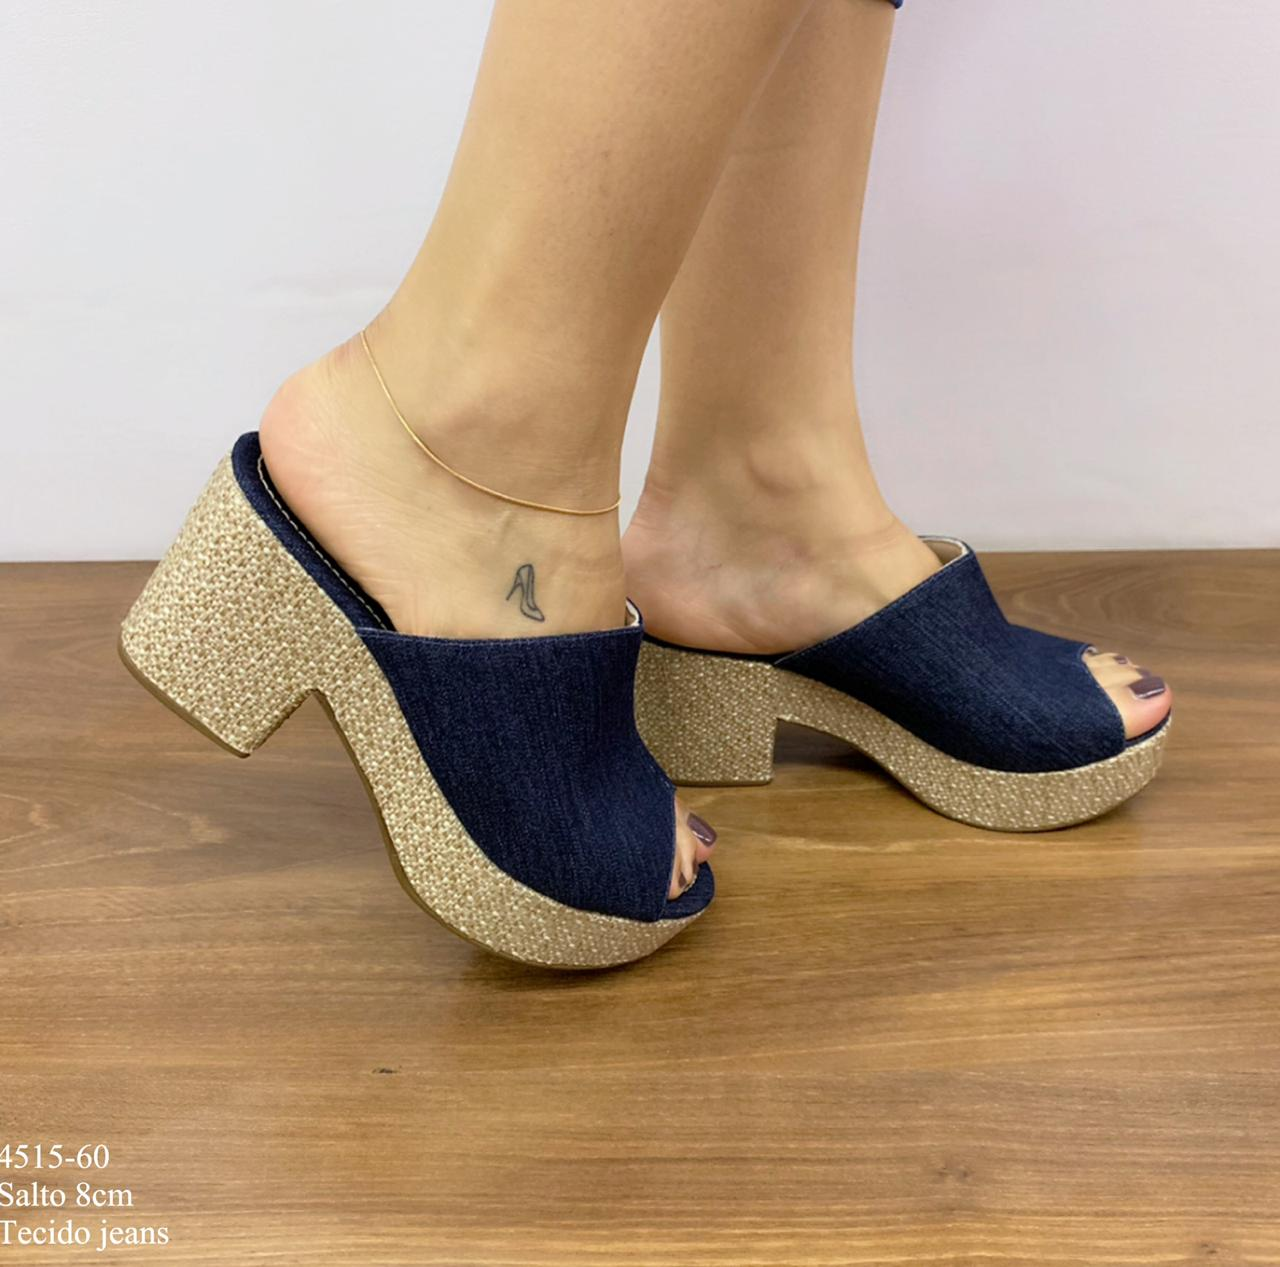 Tamanco Tecido Jeans | D-4515-60